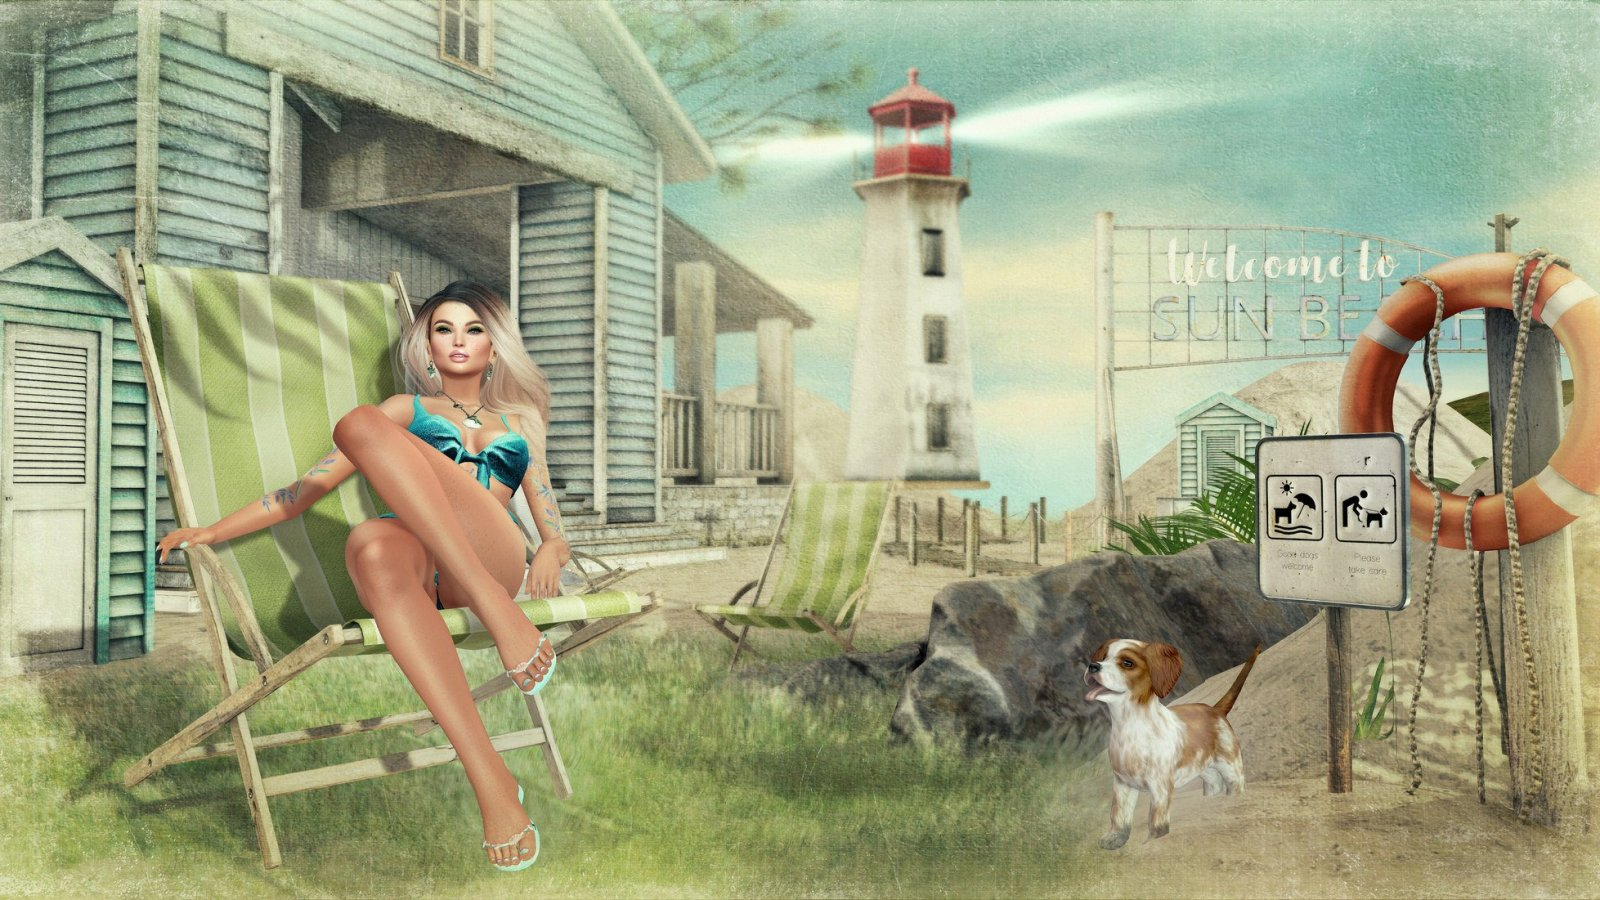 Welcome to Sun Beach